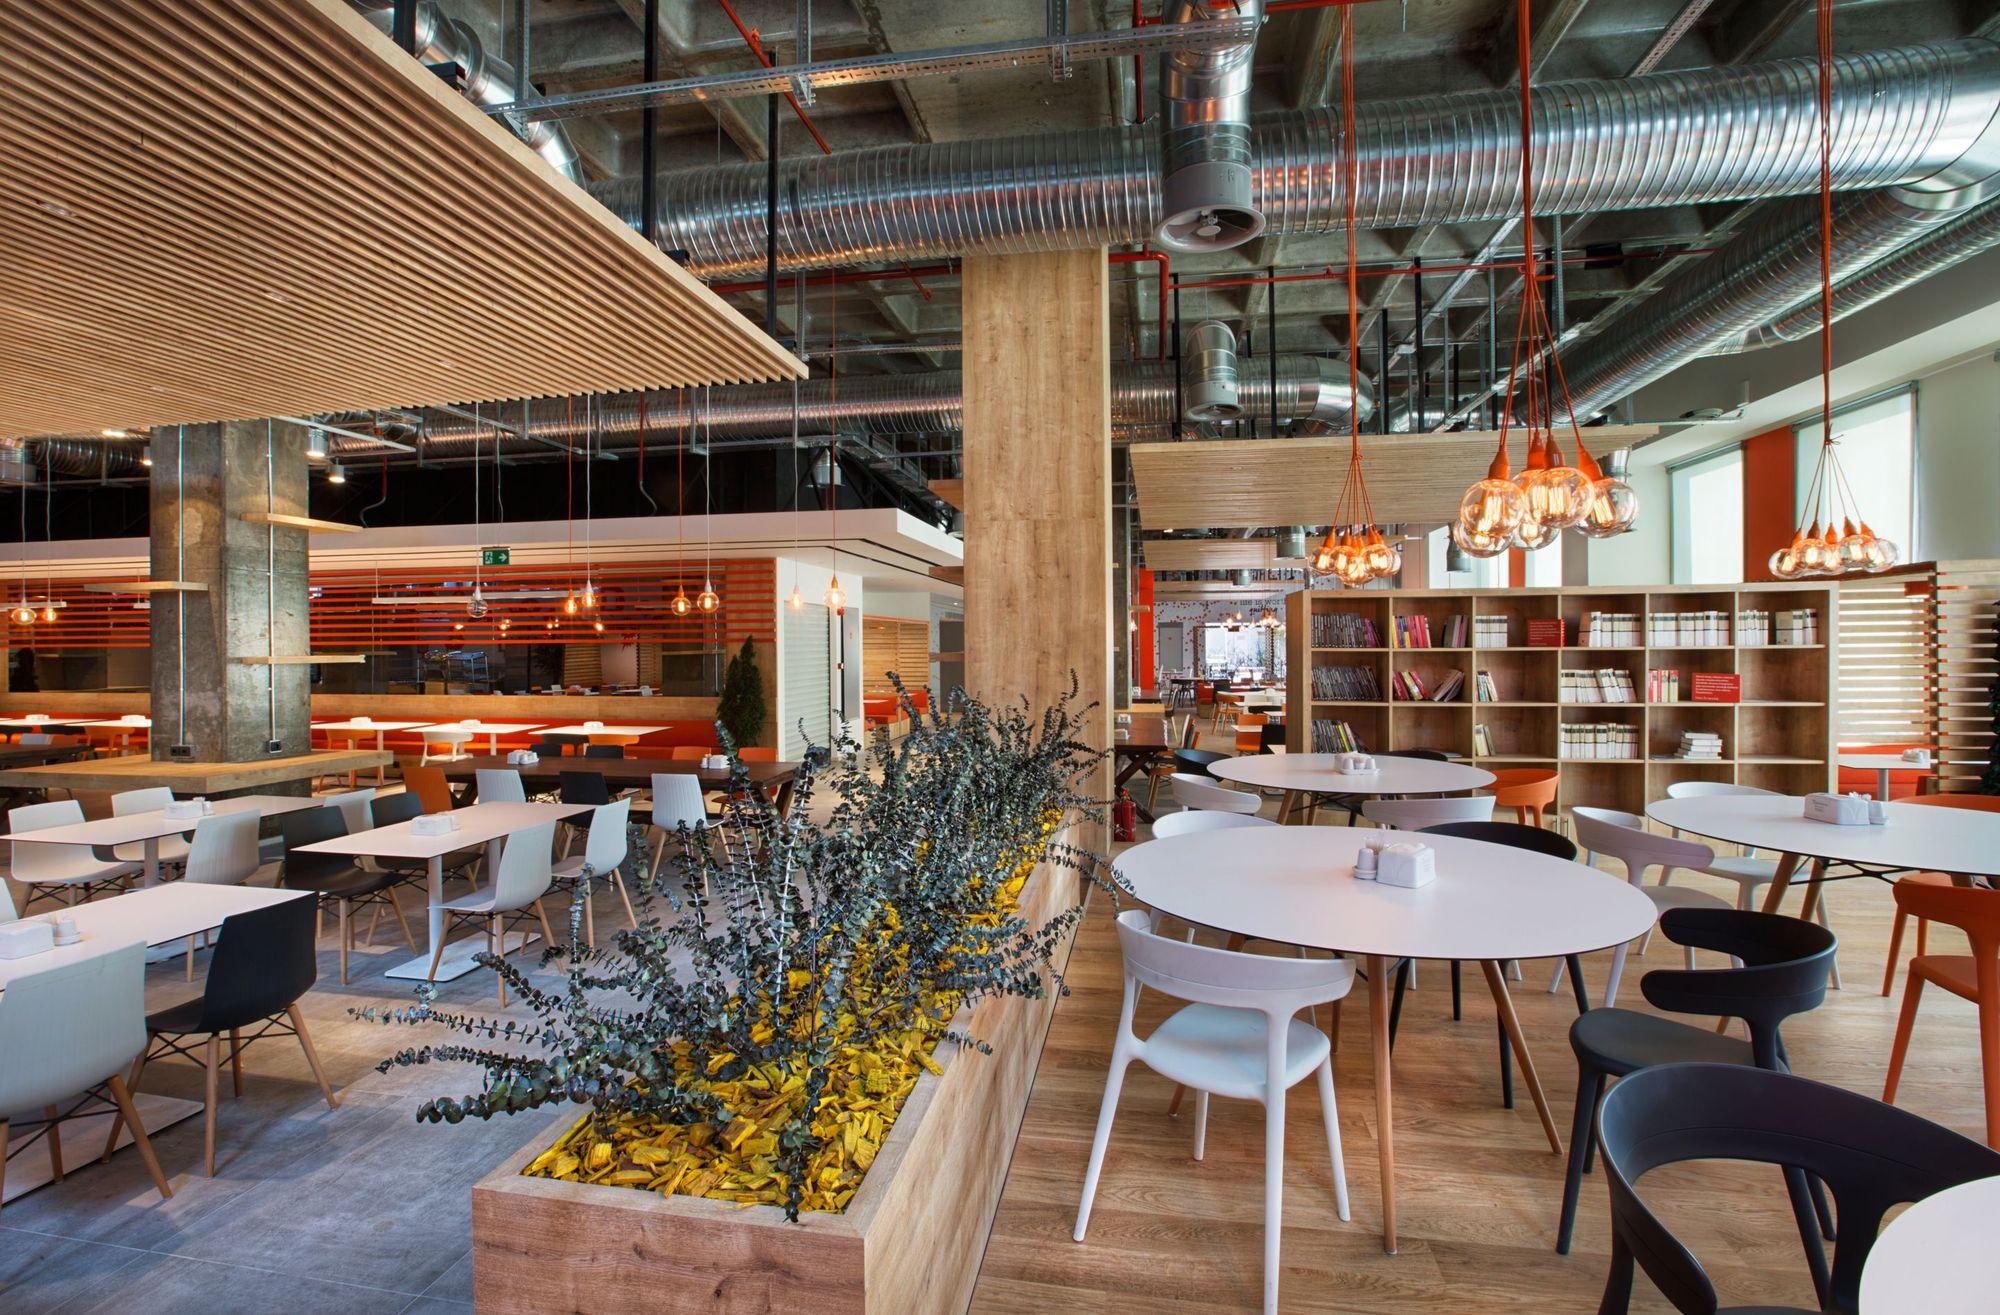 Future Food Cafe Restaurant Tubu Tubu